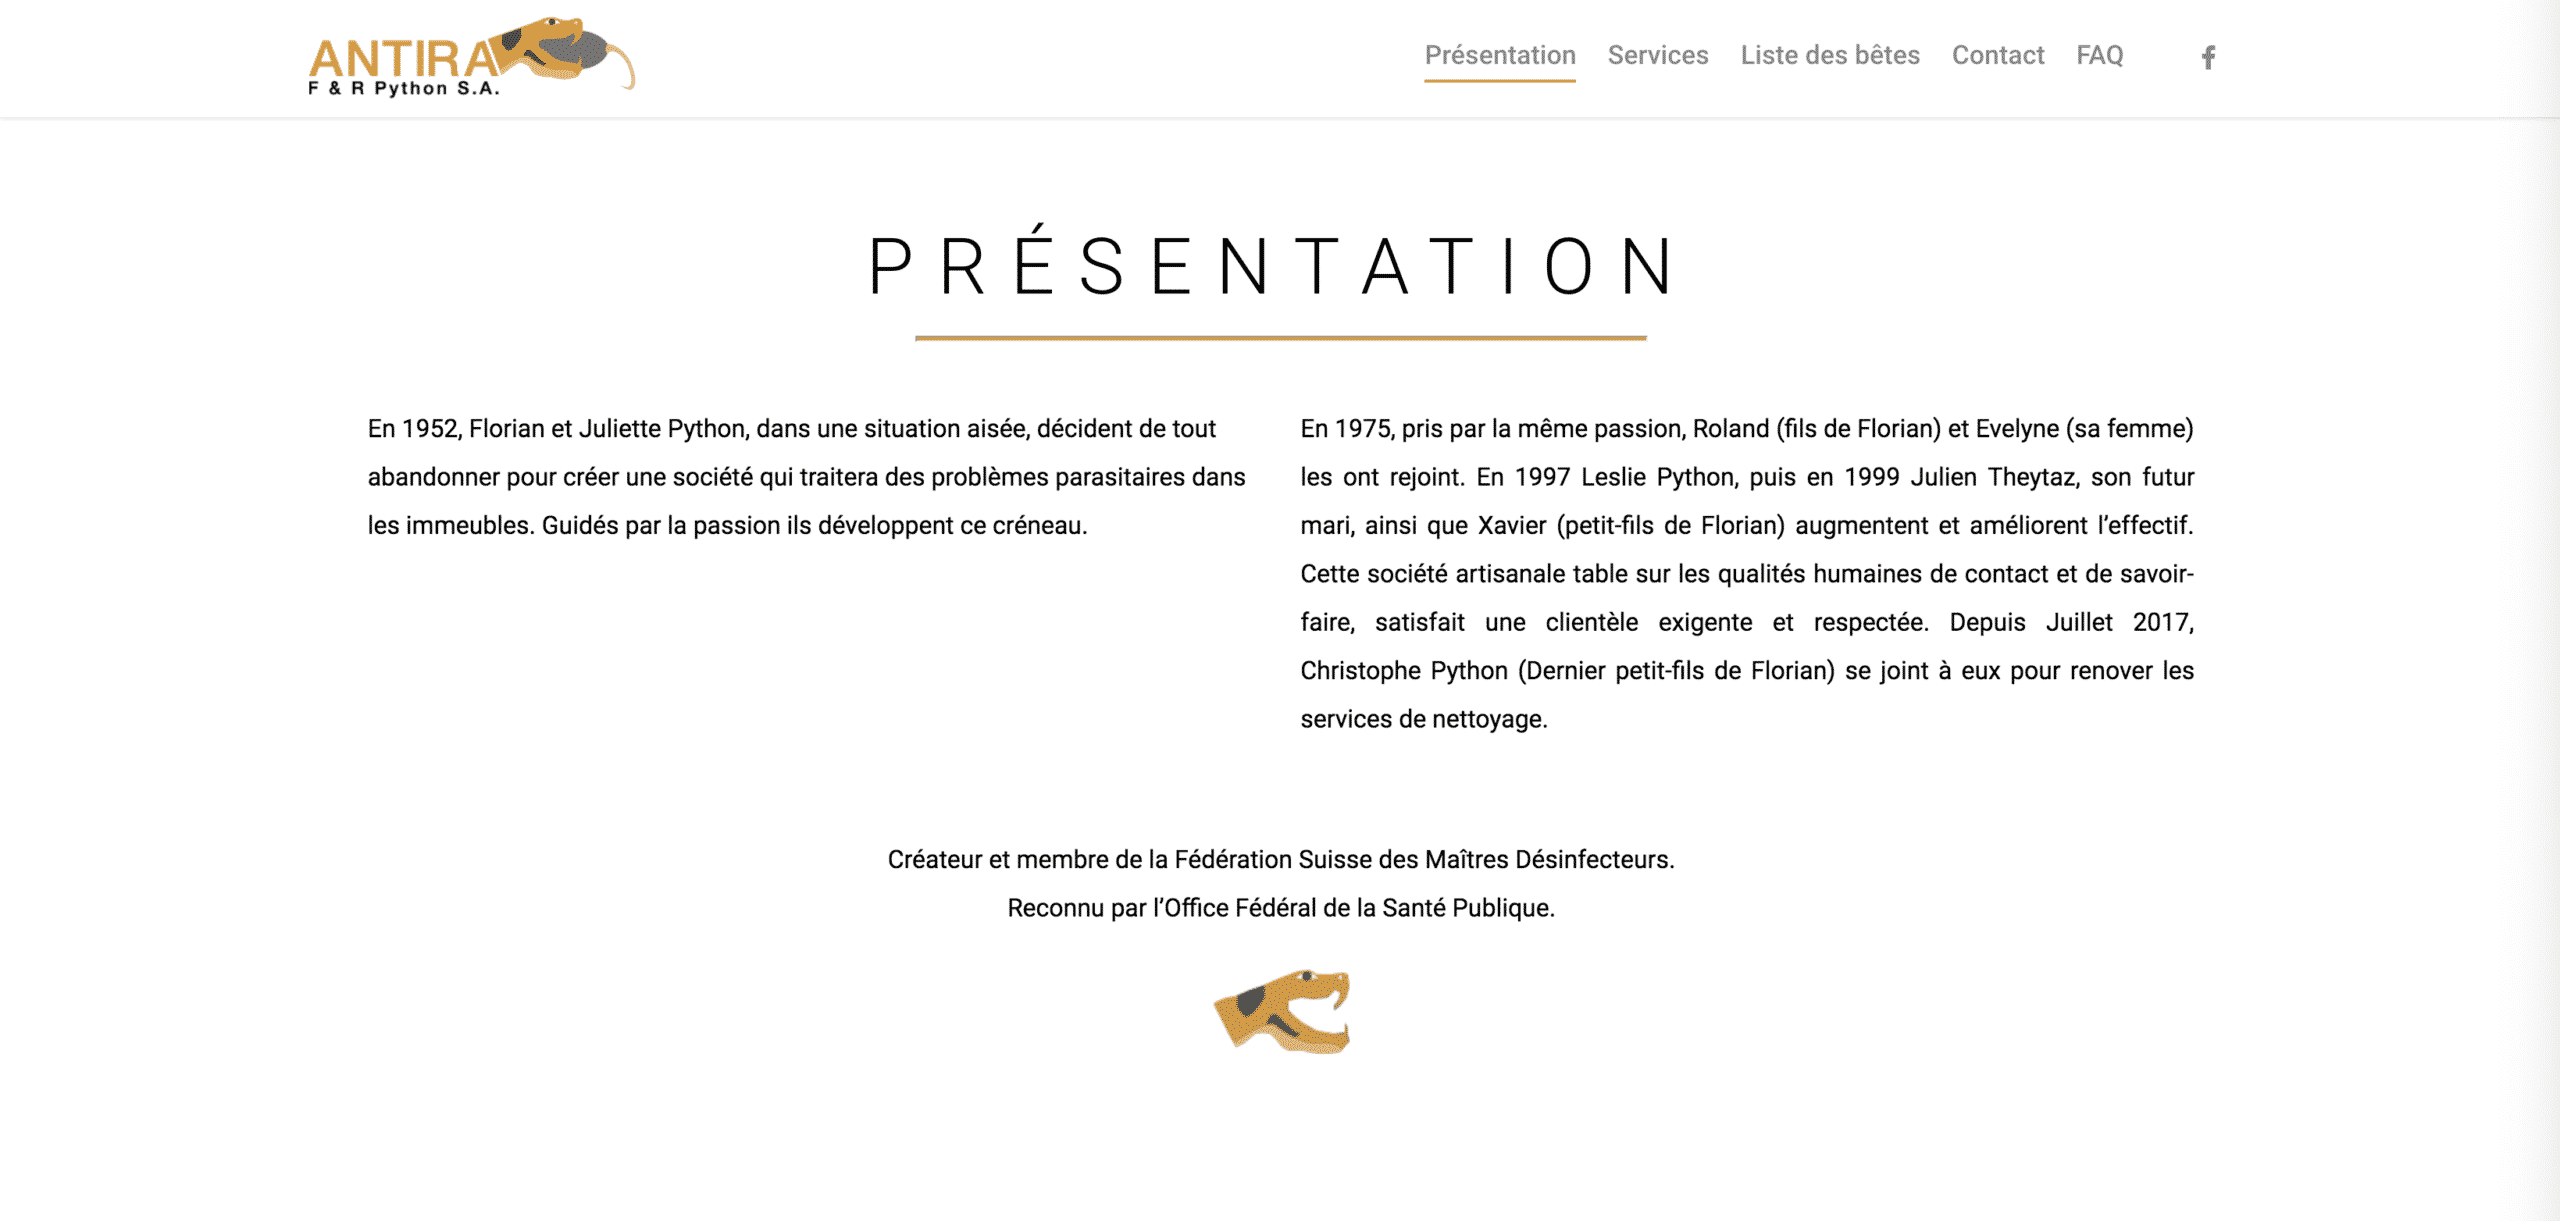 page présentation antira